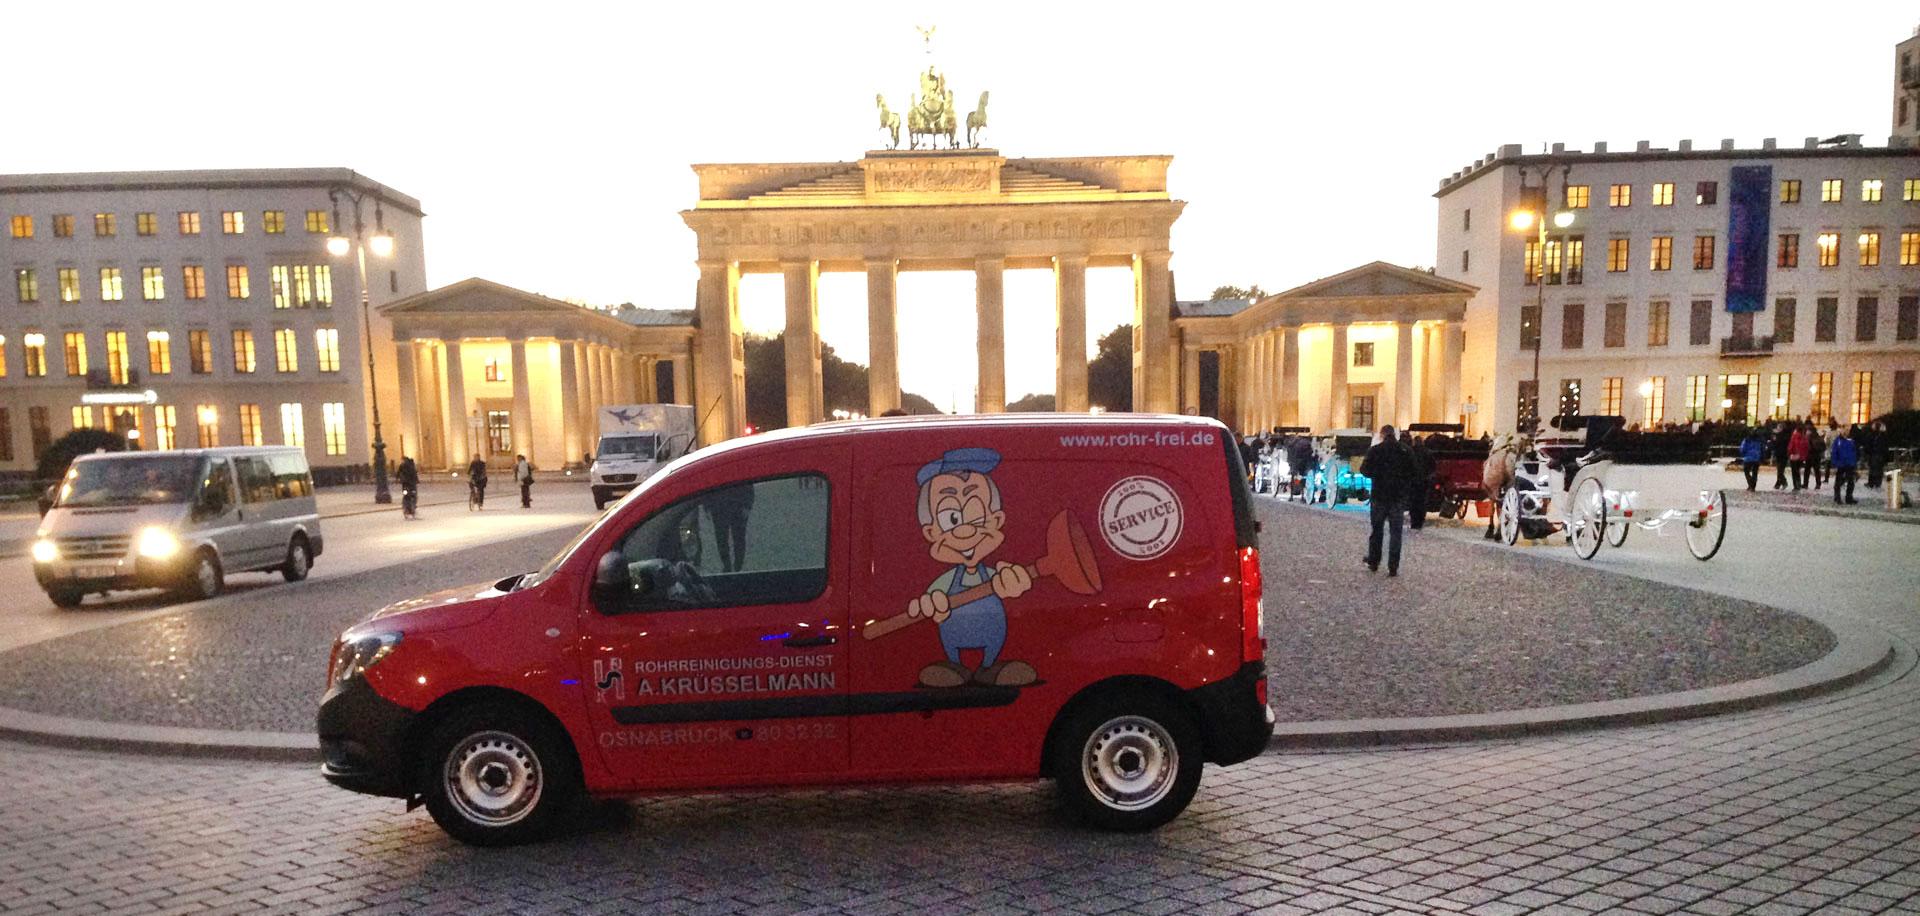 Kruesselmann_Slider_Berlin2